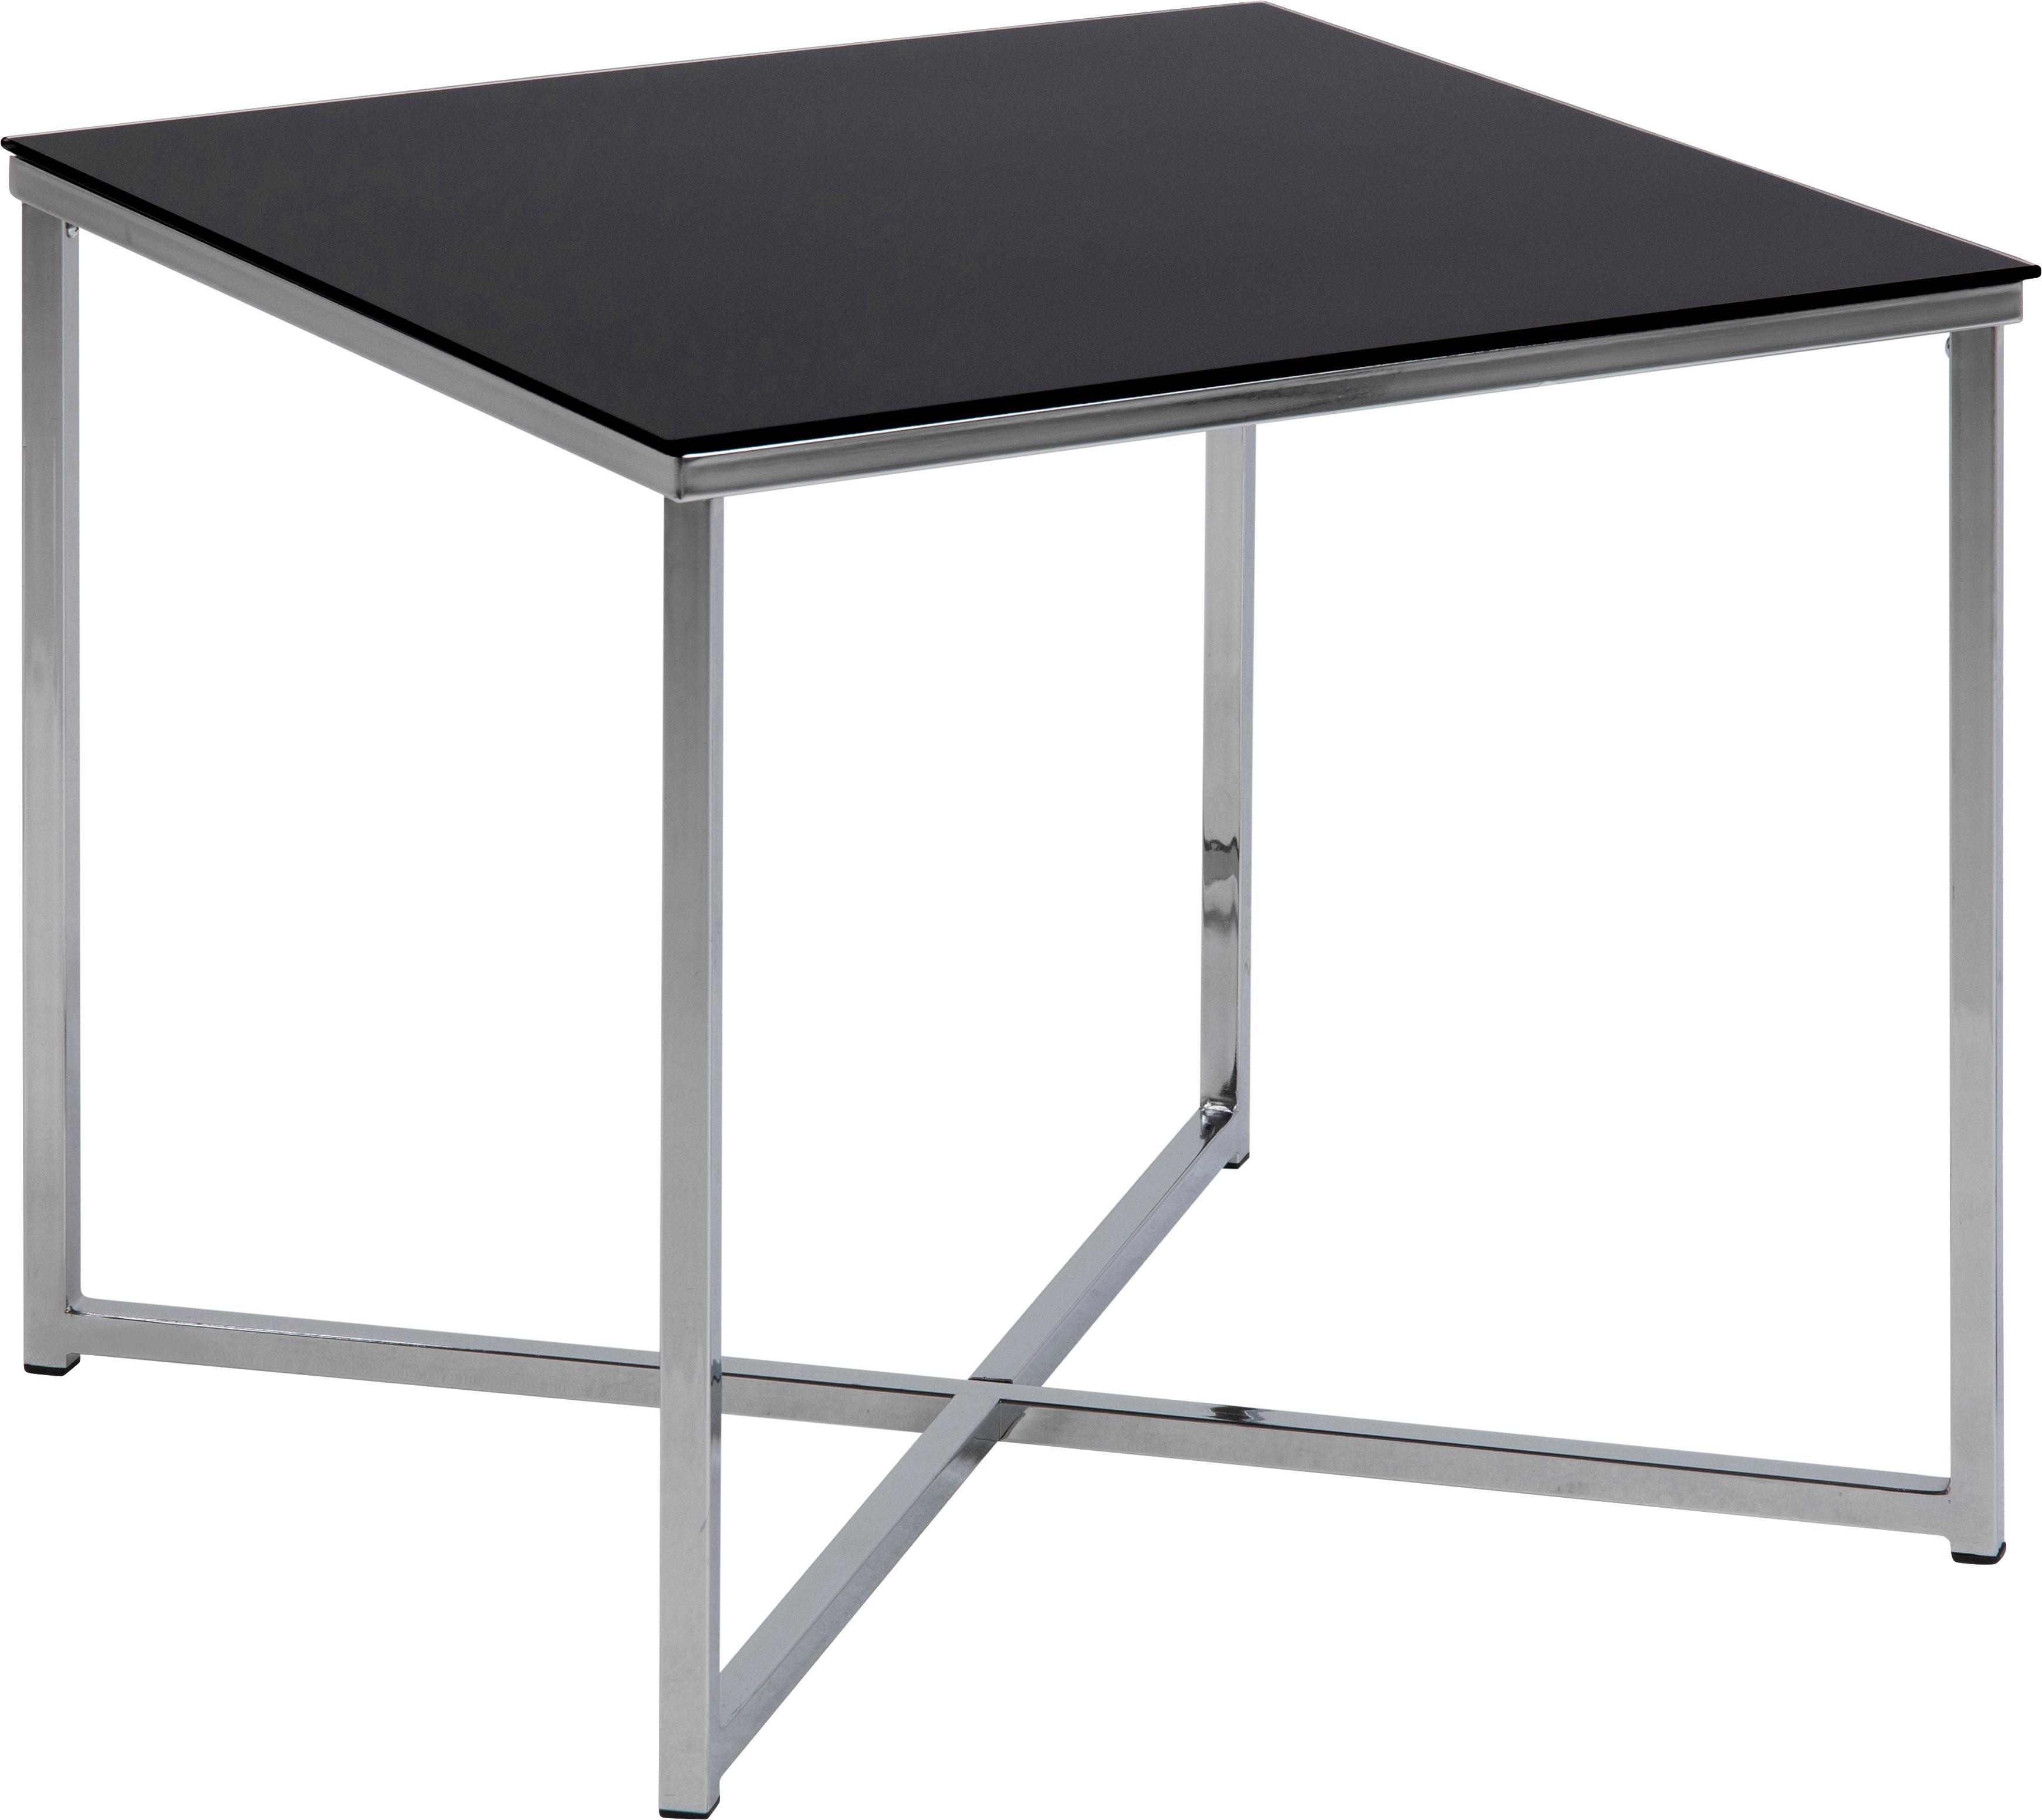 Mesa auxiliar Matheo, tablero de cristal, Estructura: metal, cromado, Tablero: vidrio laminado, Negro, metal cromado, An 50 x Al 45 cm